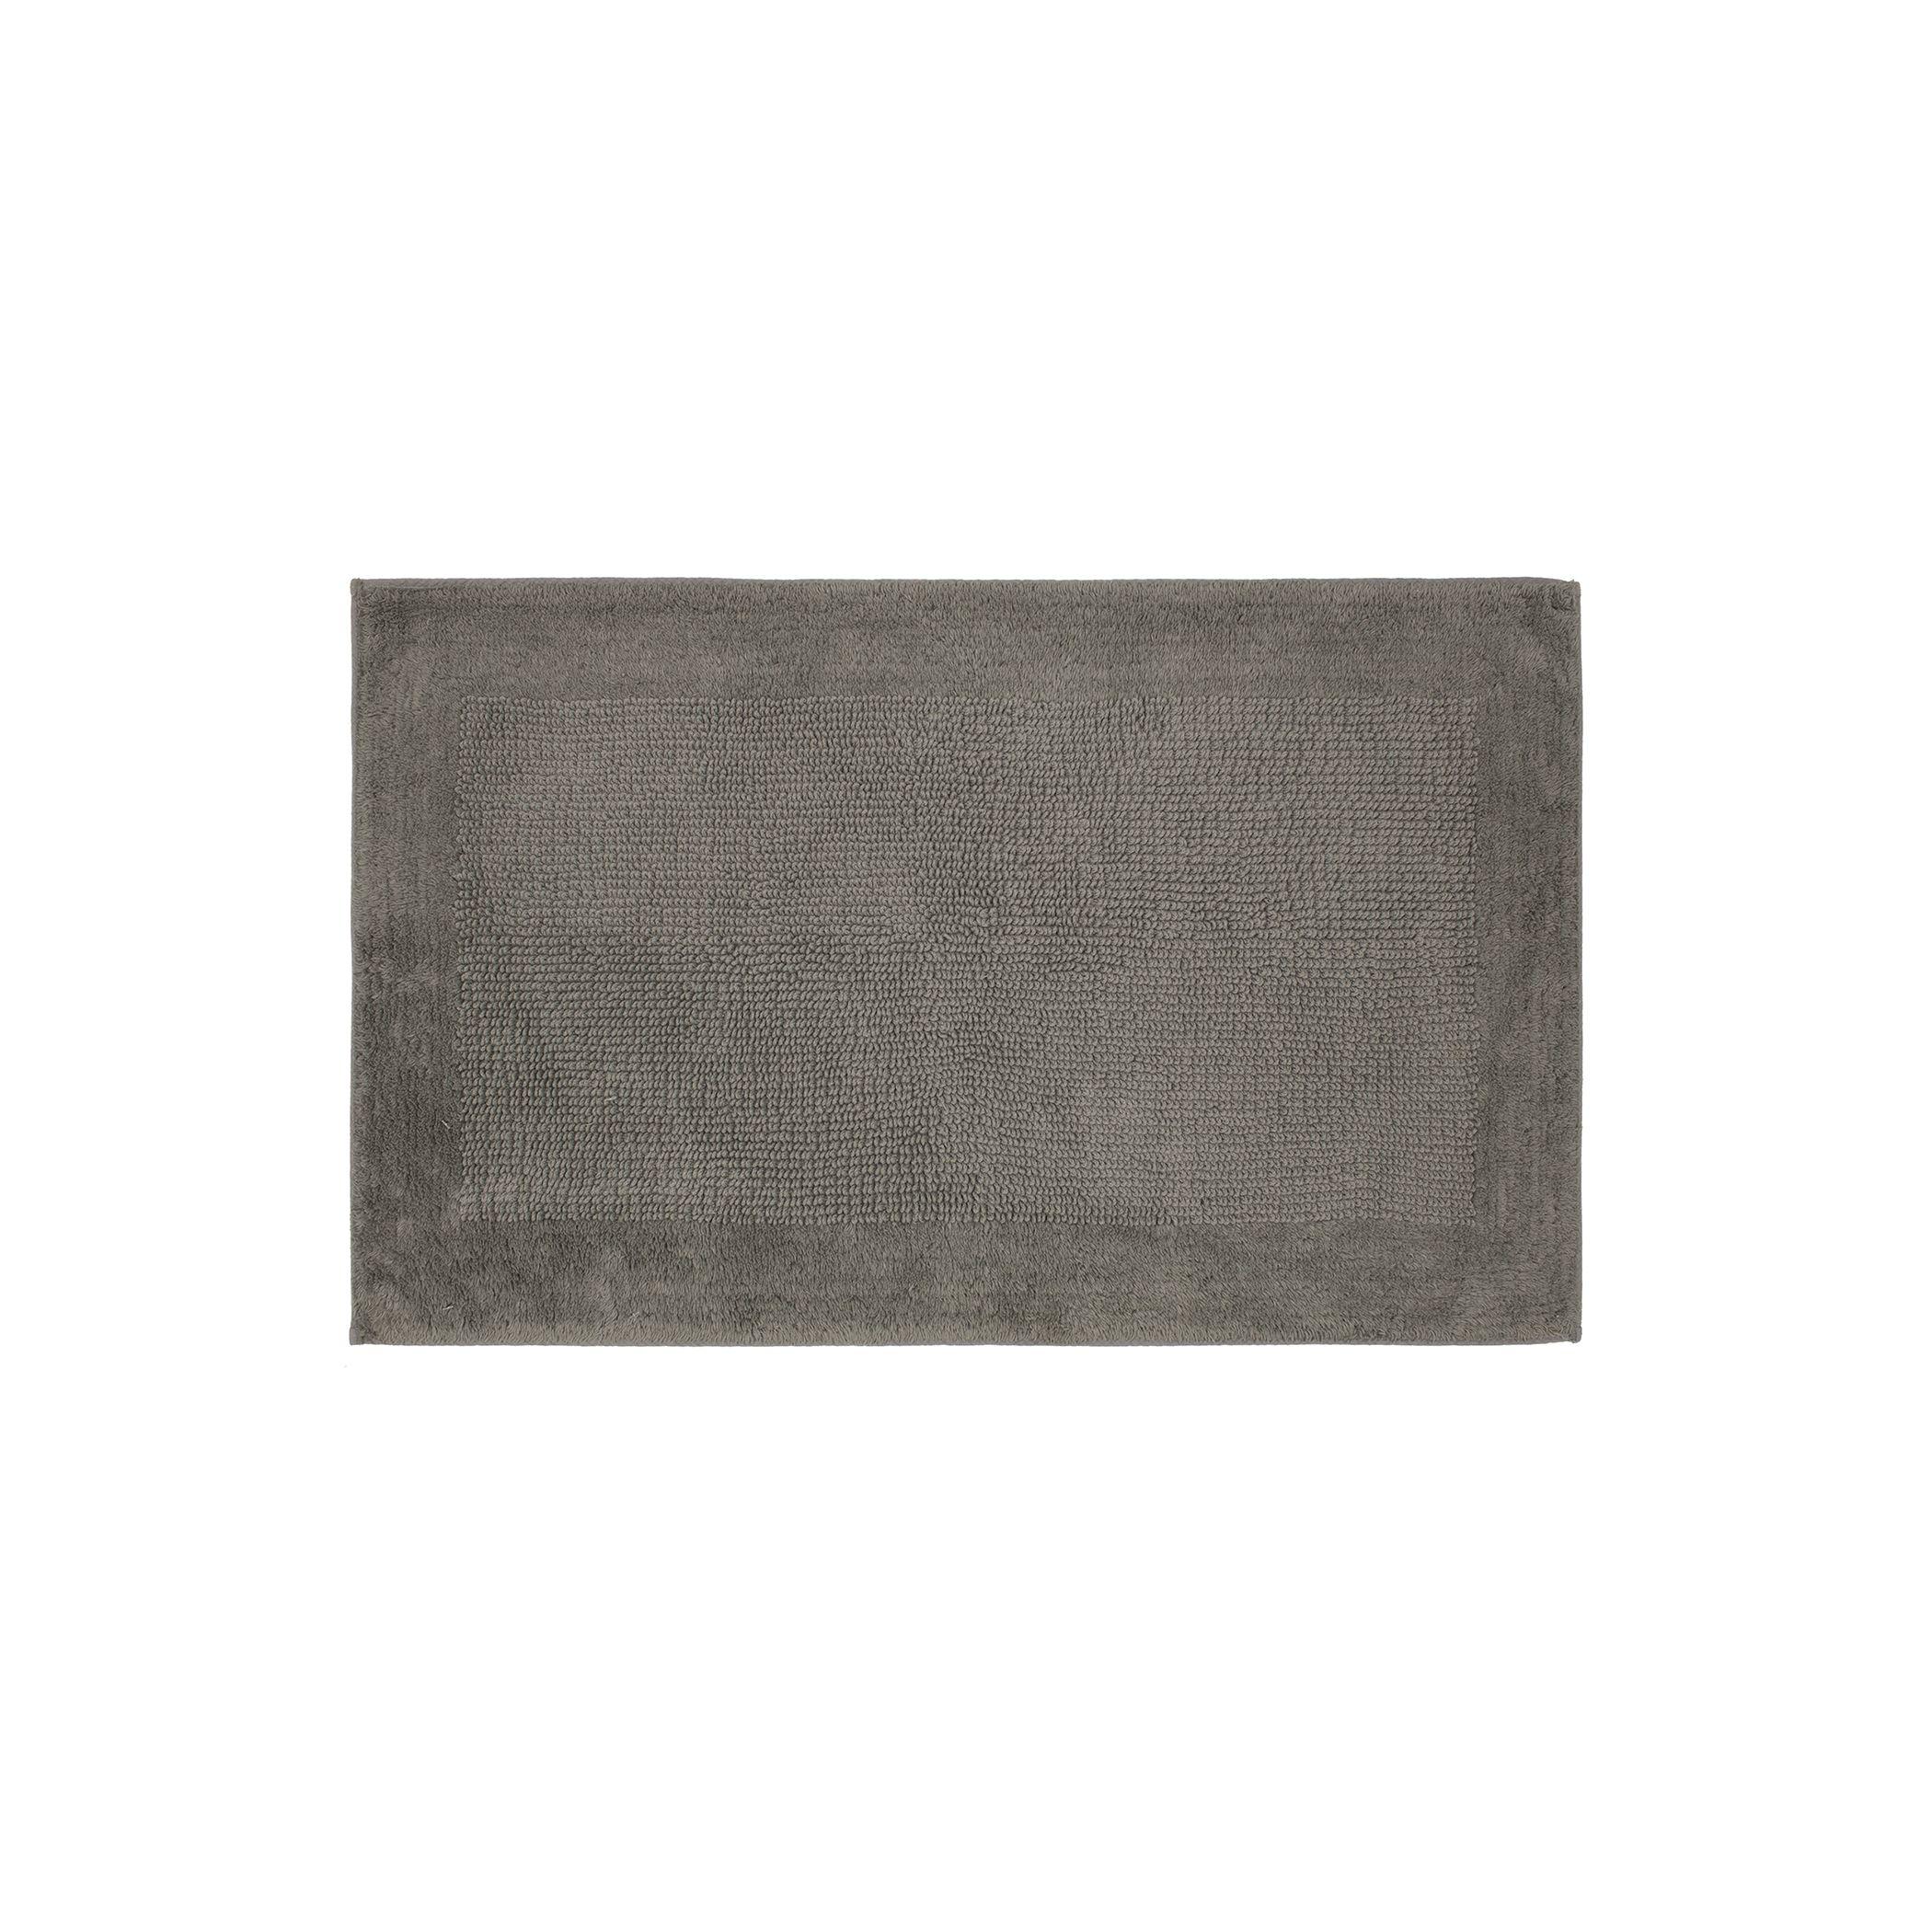 Charmant SONOMA Goods For Life™ Cotton Reversible Solid Border Bath Rug   17u0027 X 24